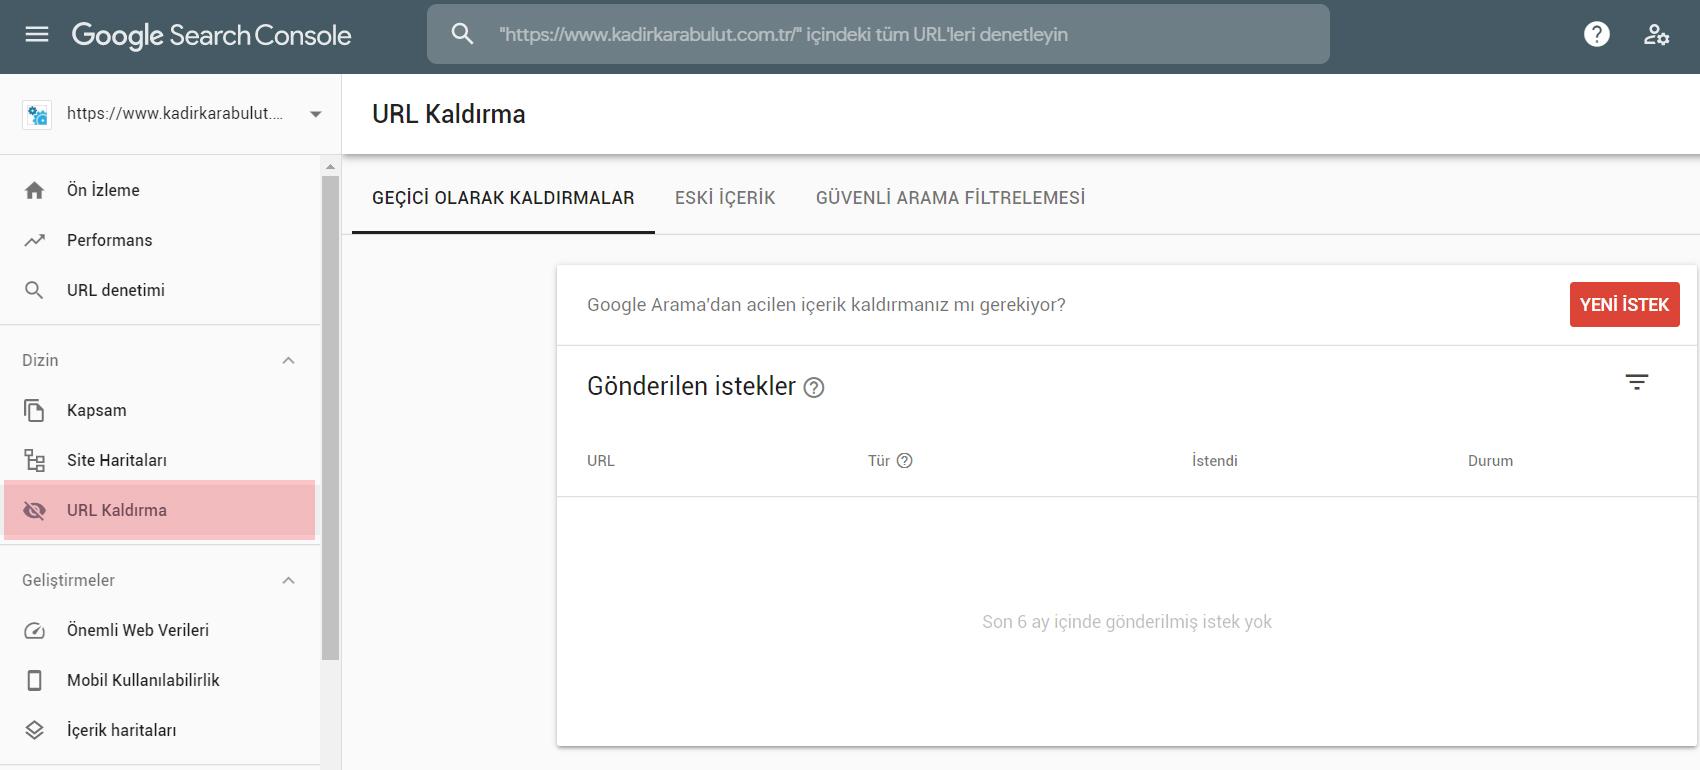 google search console url kaldırma